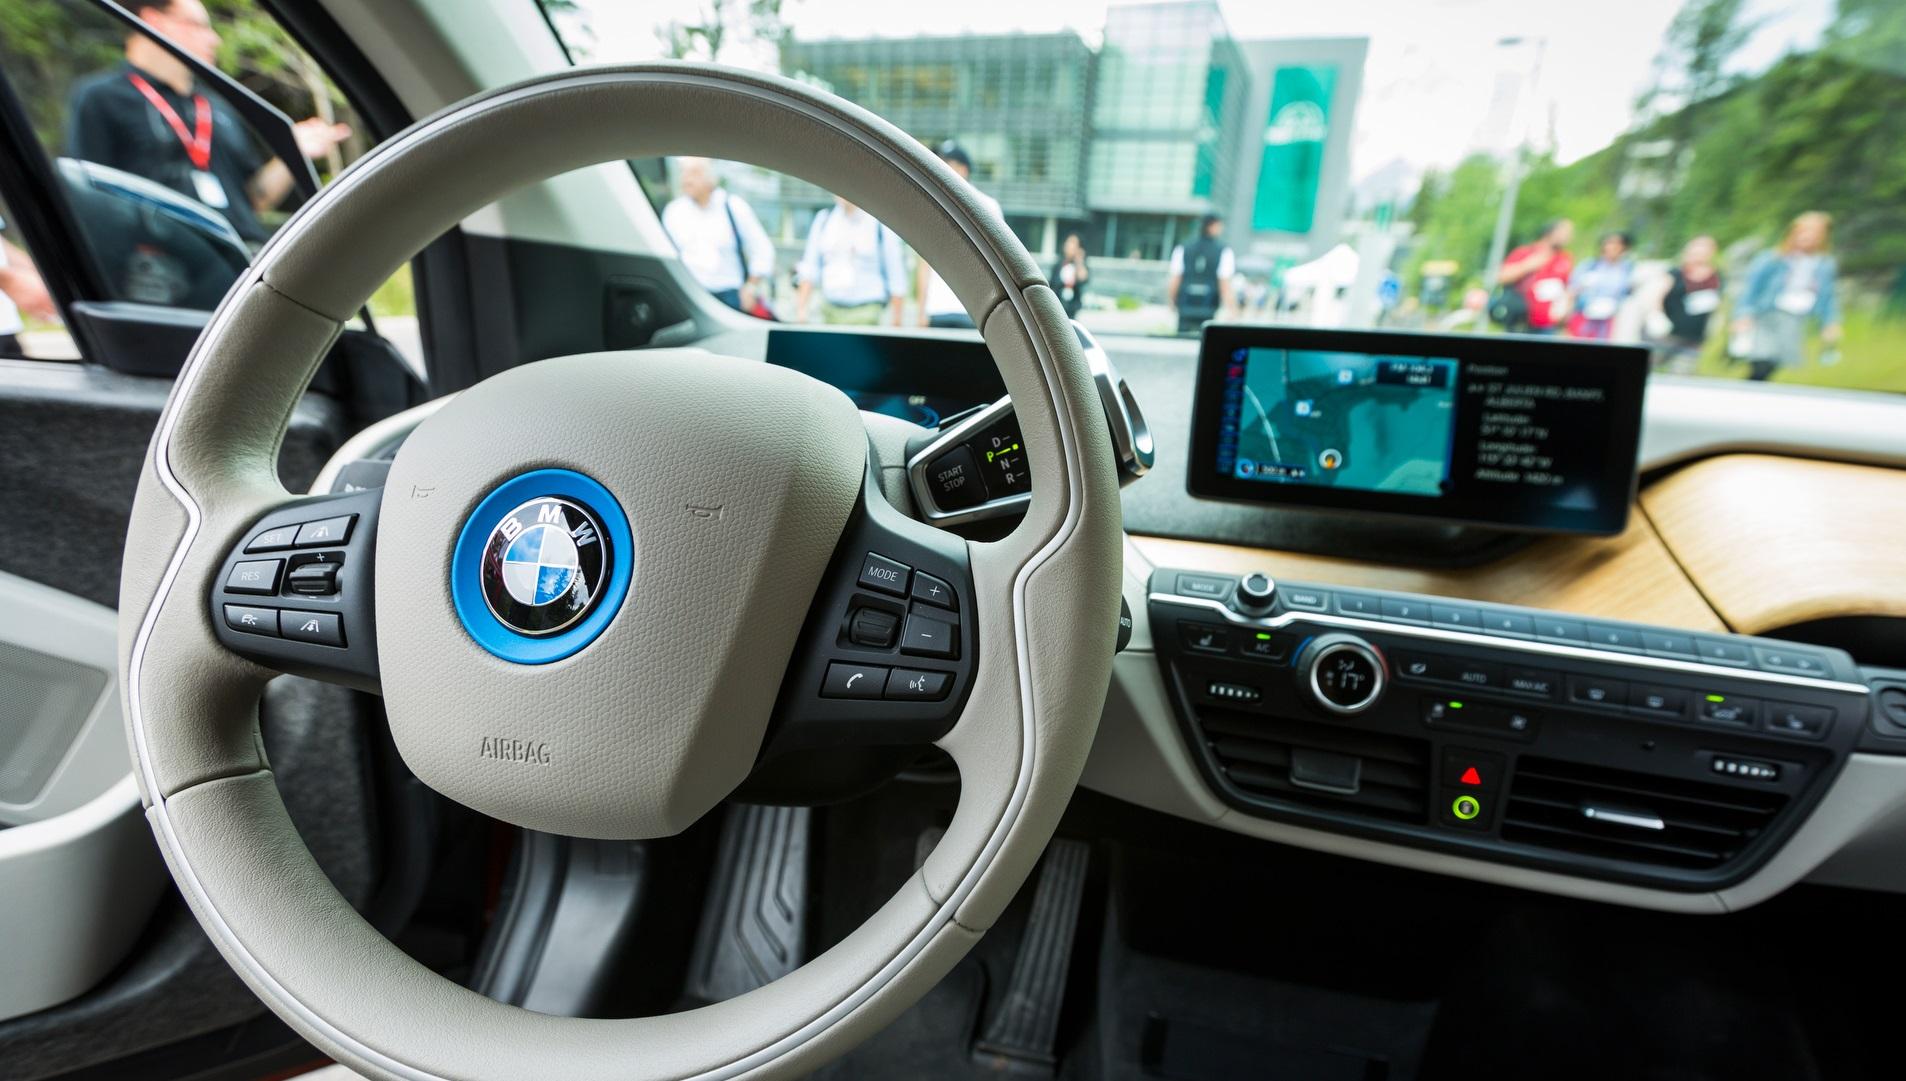 BMW trabaja en coches eléctricos con 700 km de autonomía